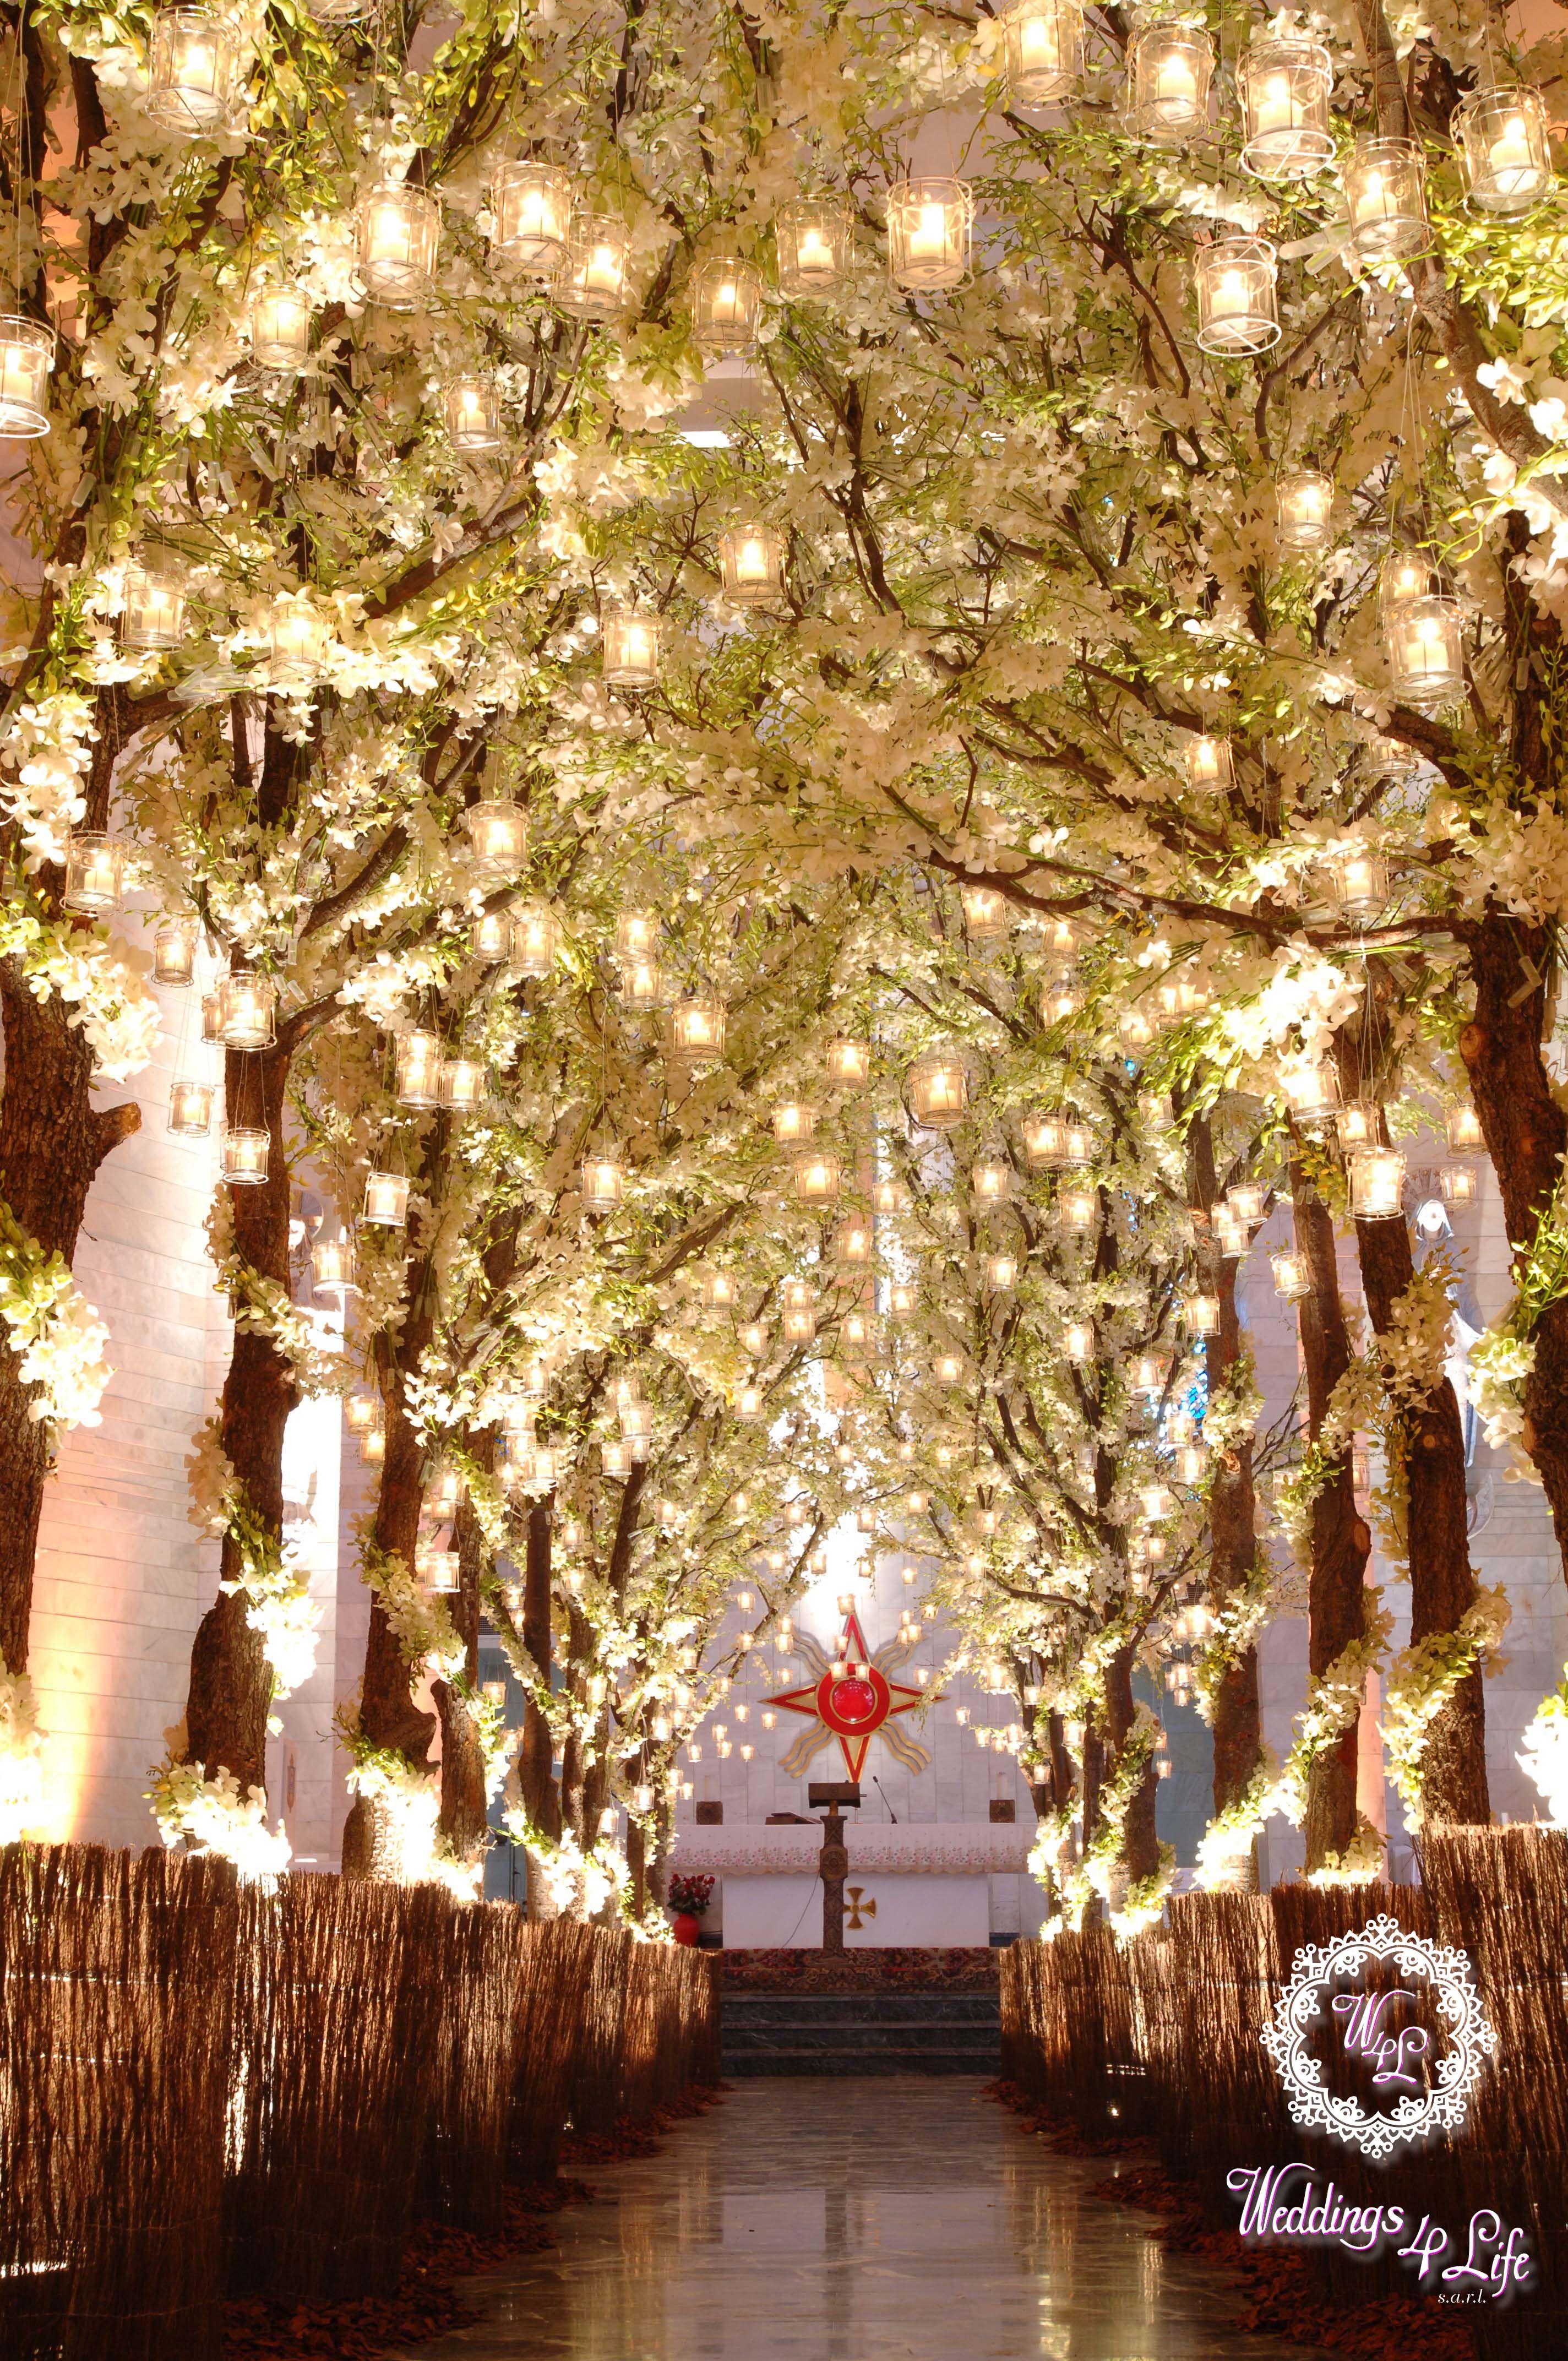 Breathtaking church decoration white trees with candles michael white trees with candles white trees candles weddings lebanon junglespirit Image collections